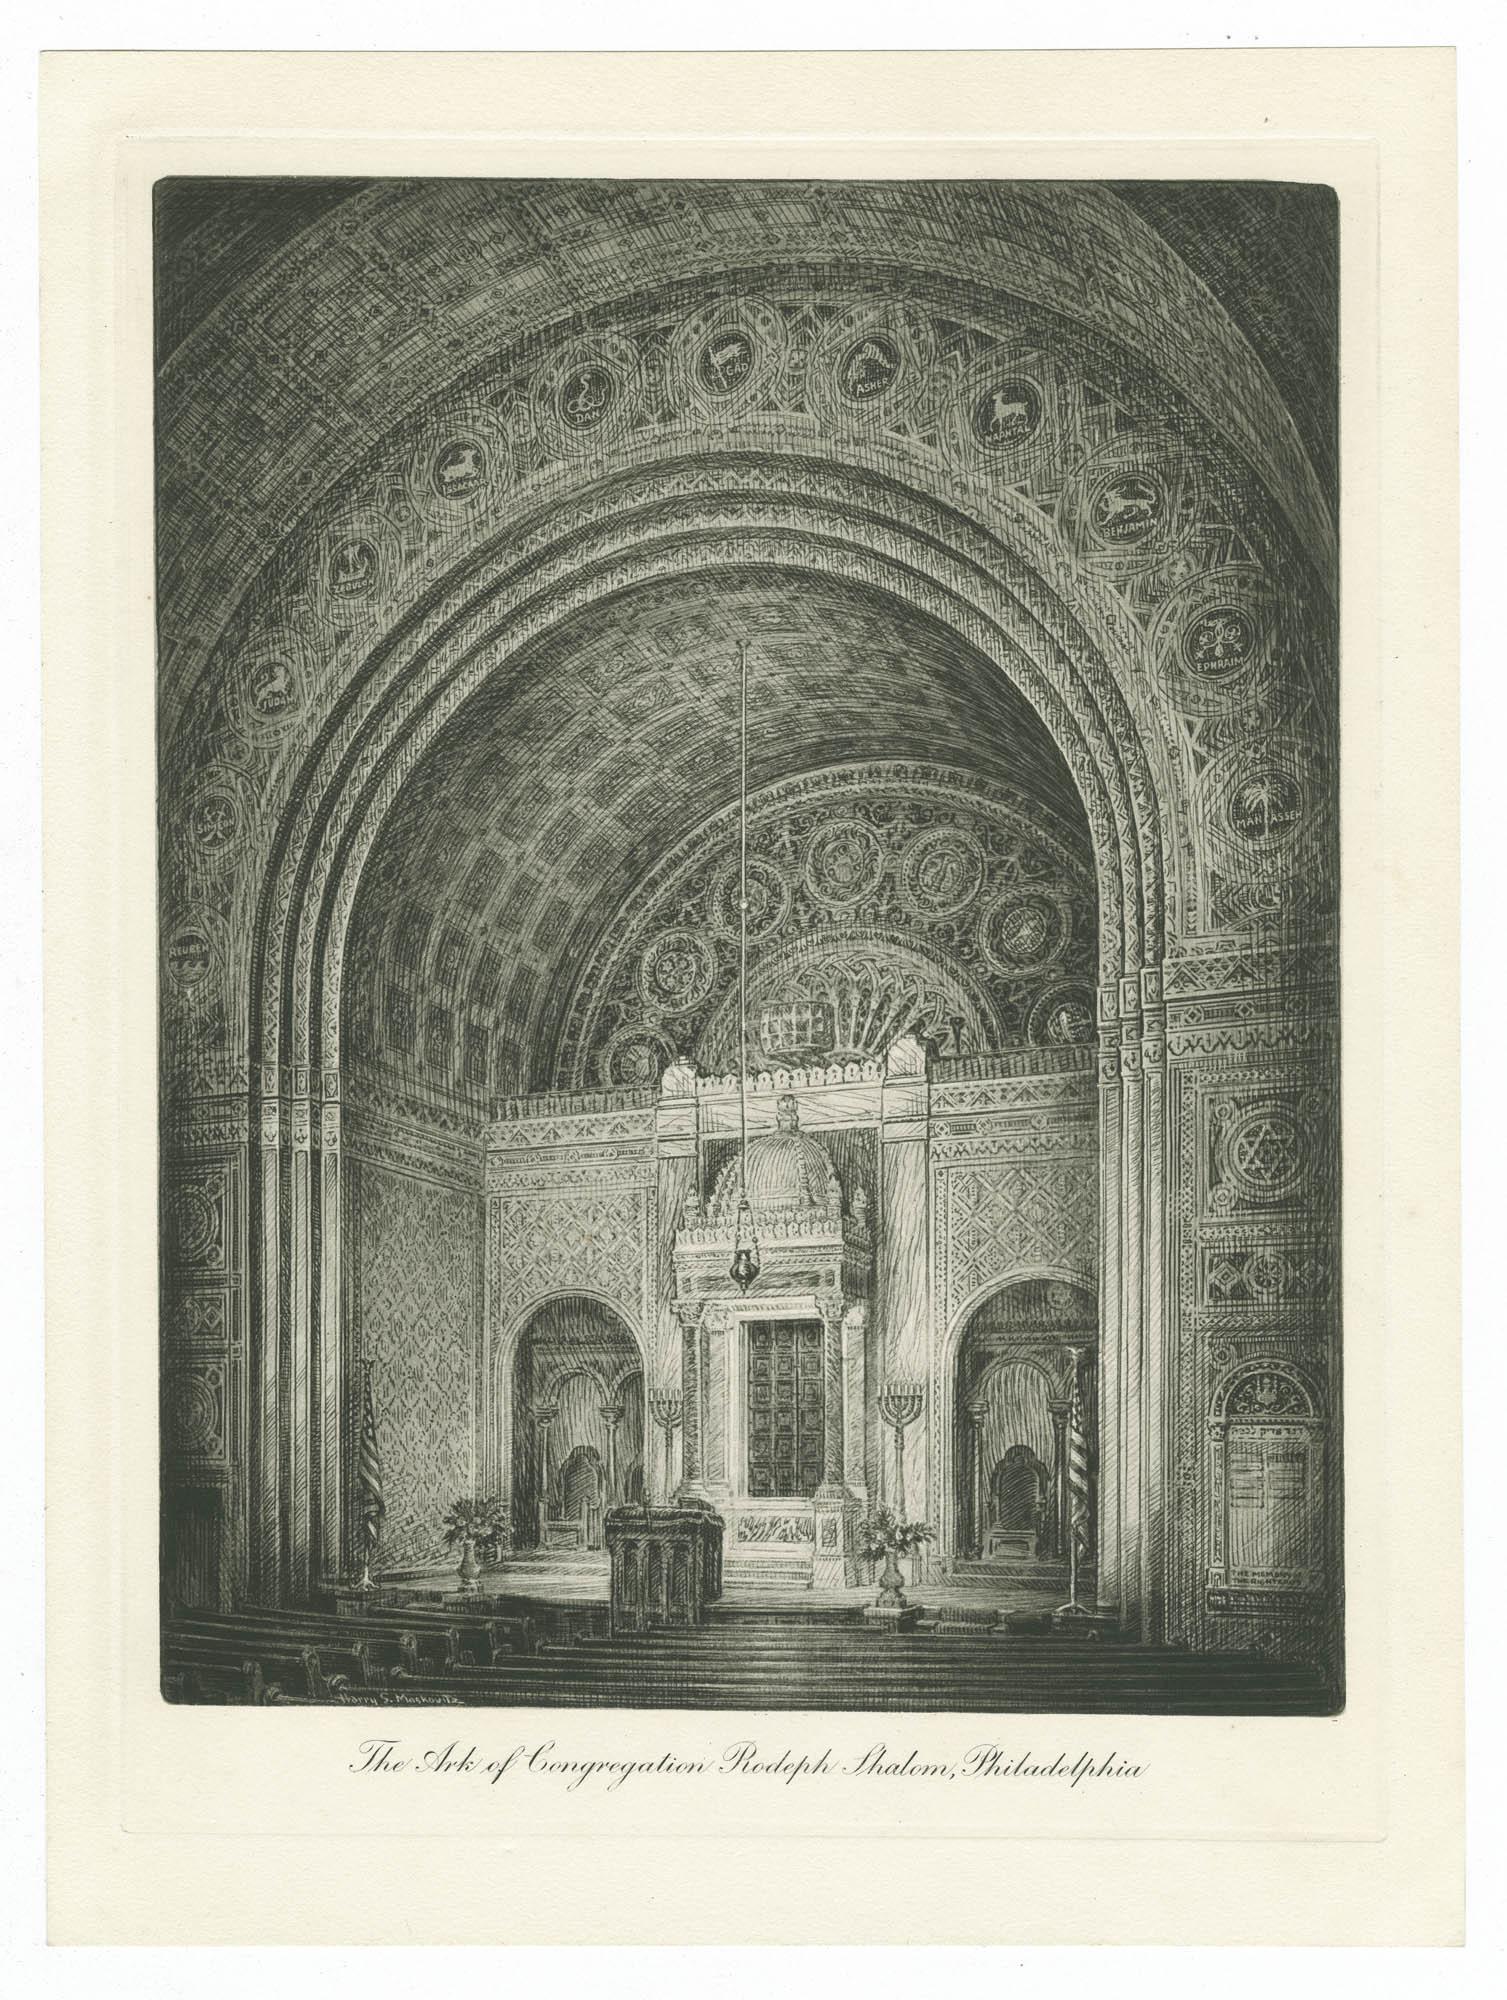 The Ark of Congregation Rodeph Shalom, Philadelphia